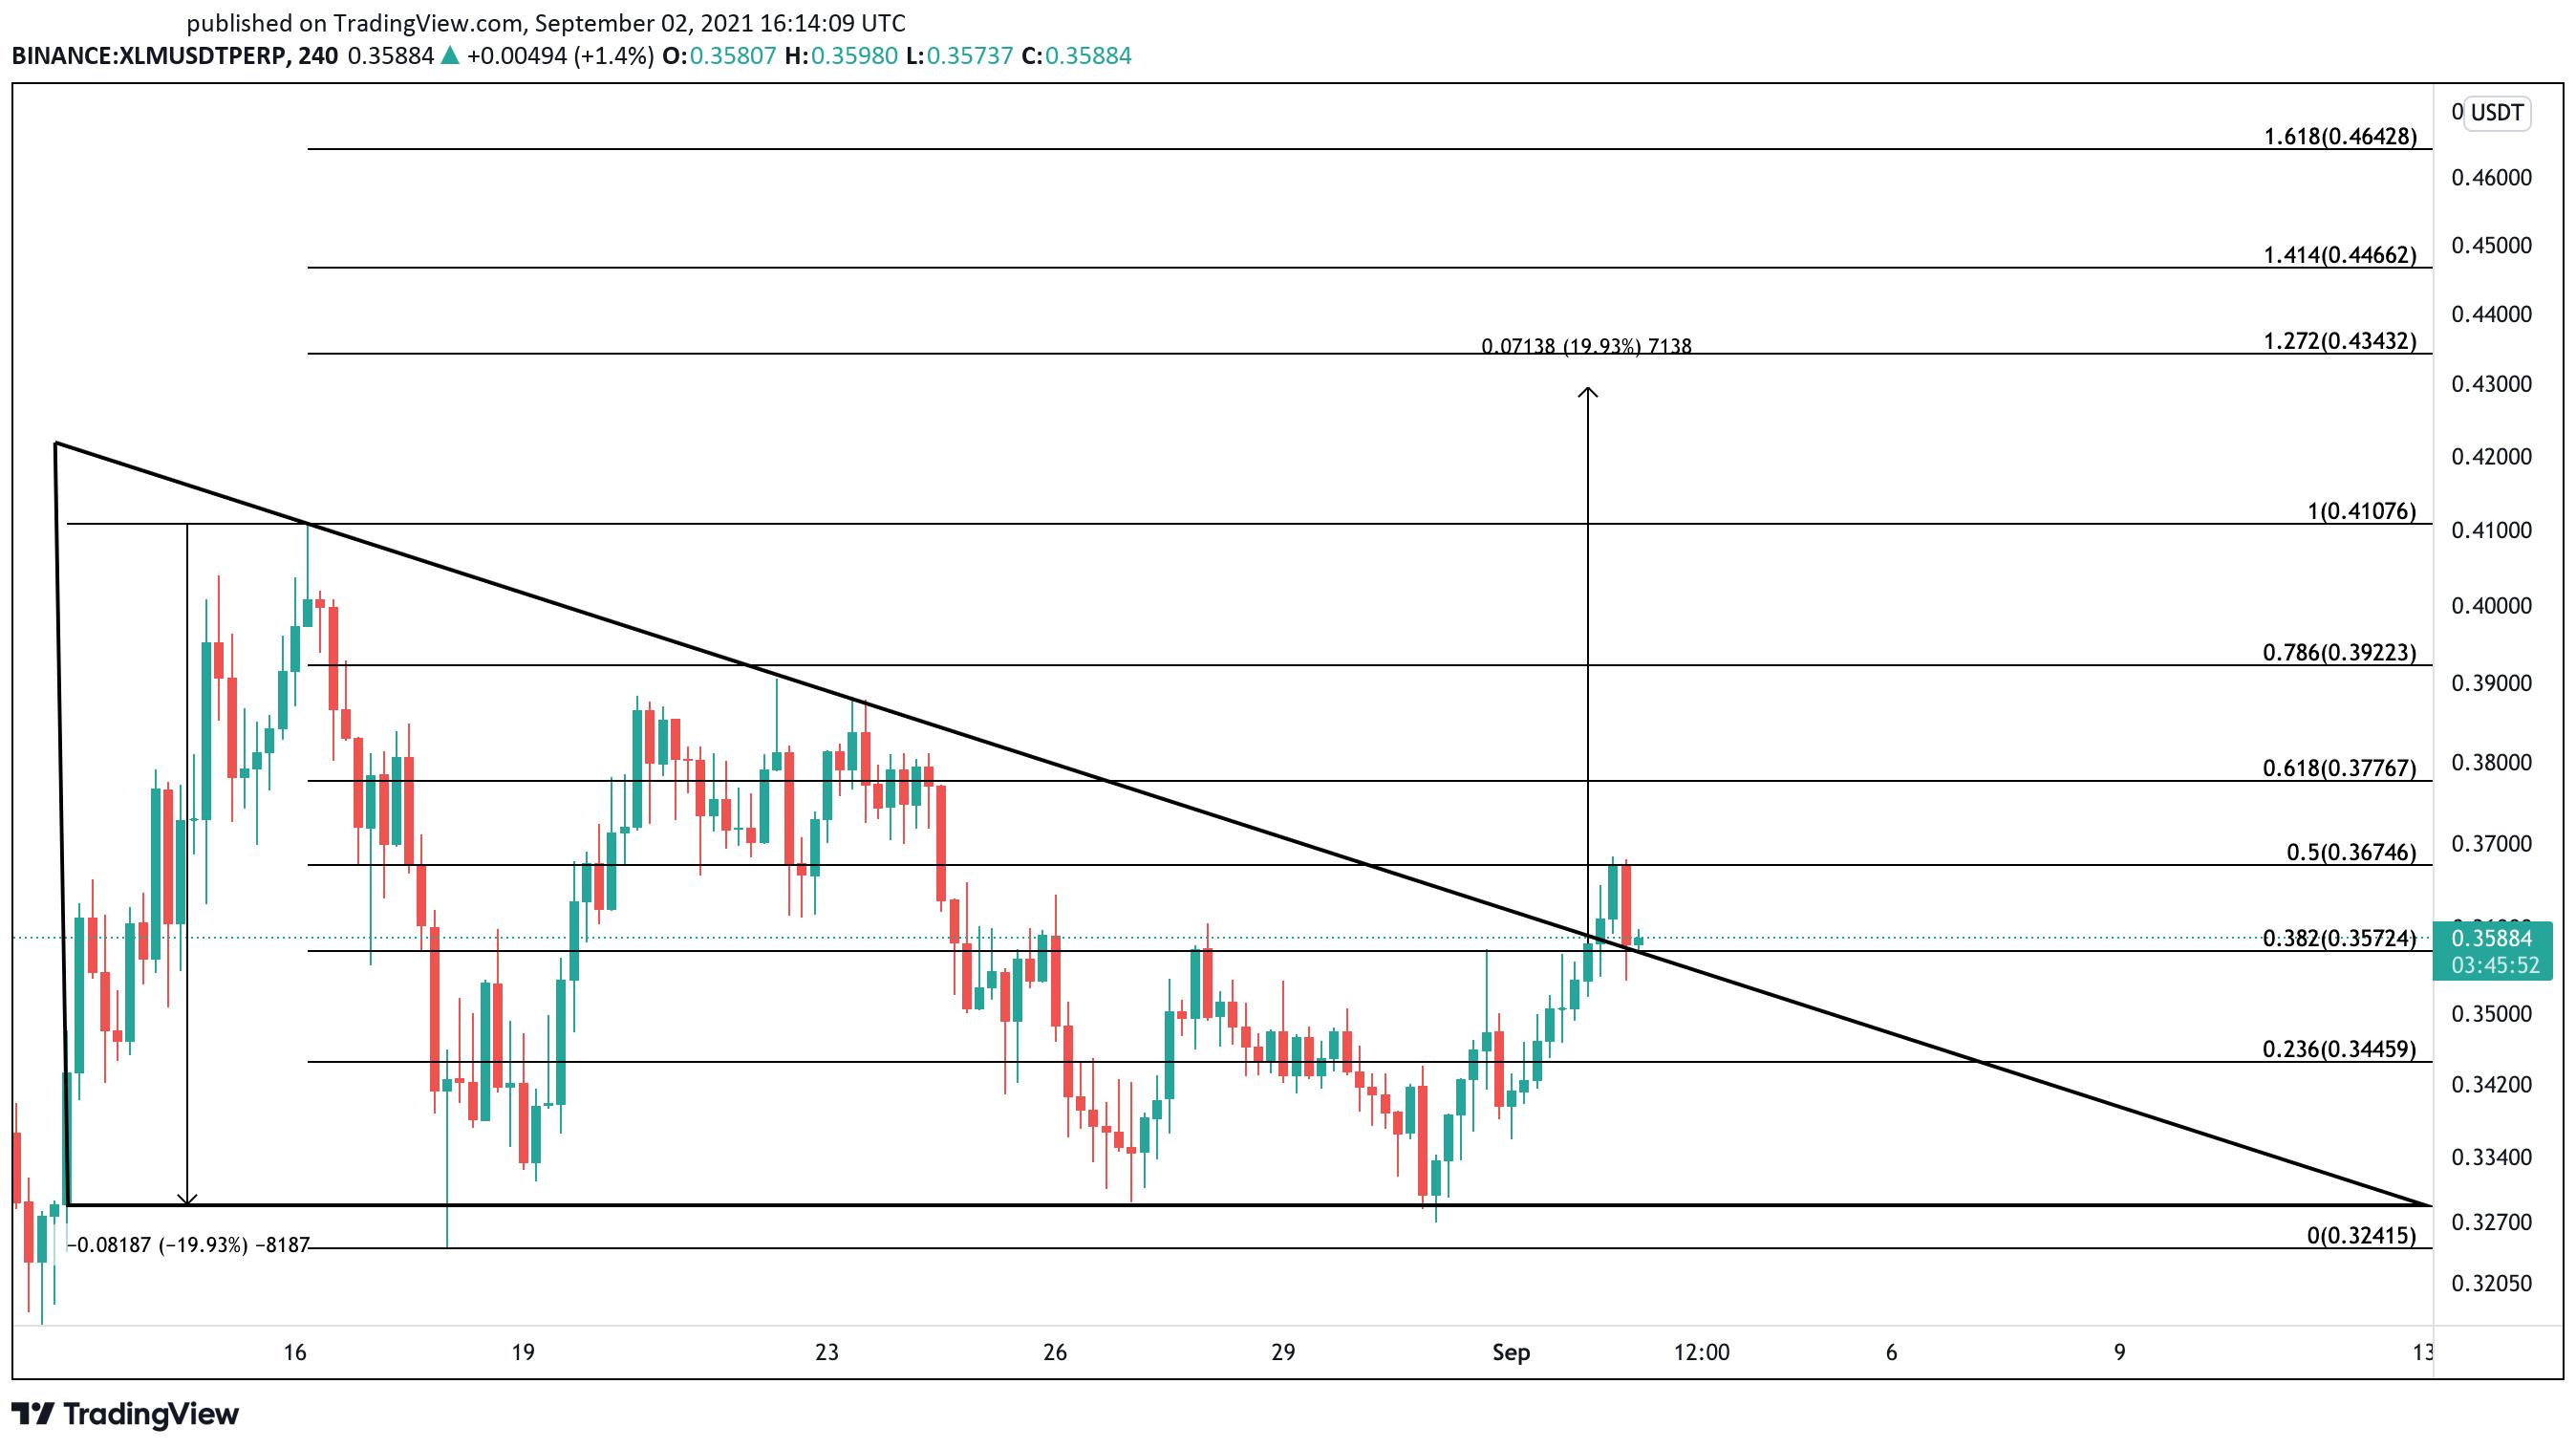 Stellar XLM US dollar price chart